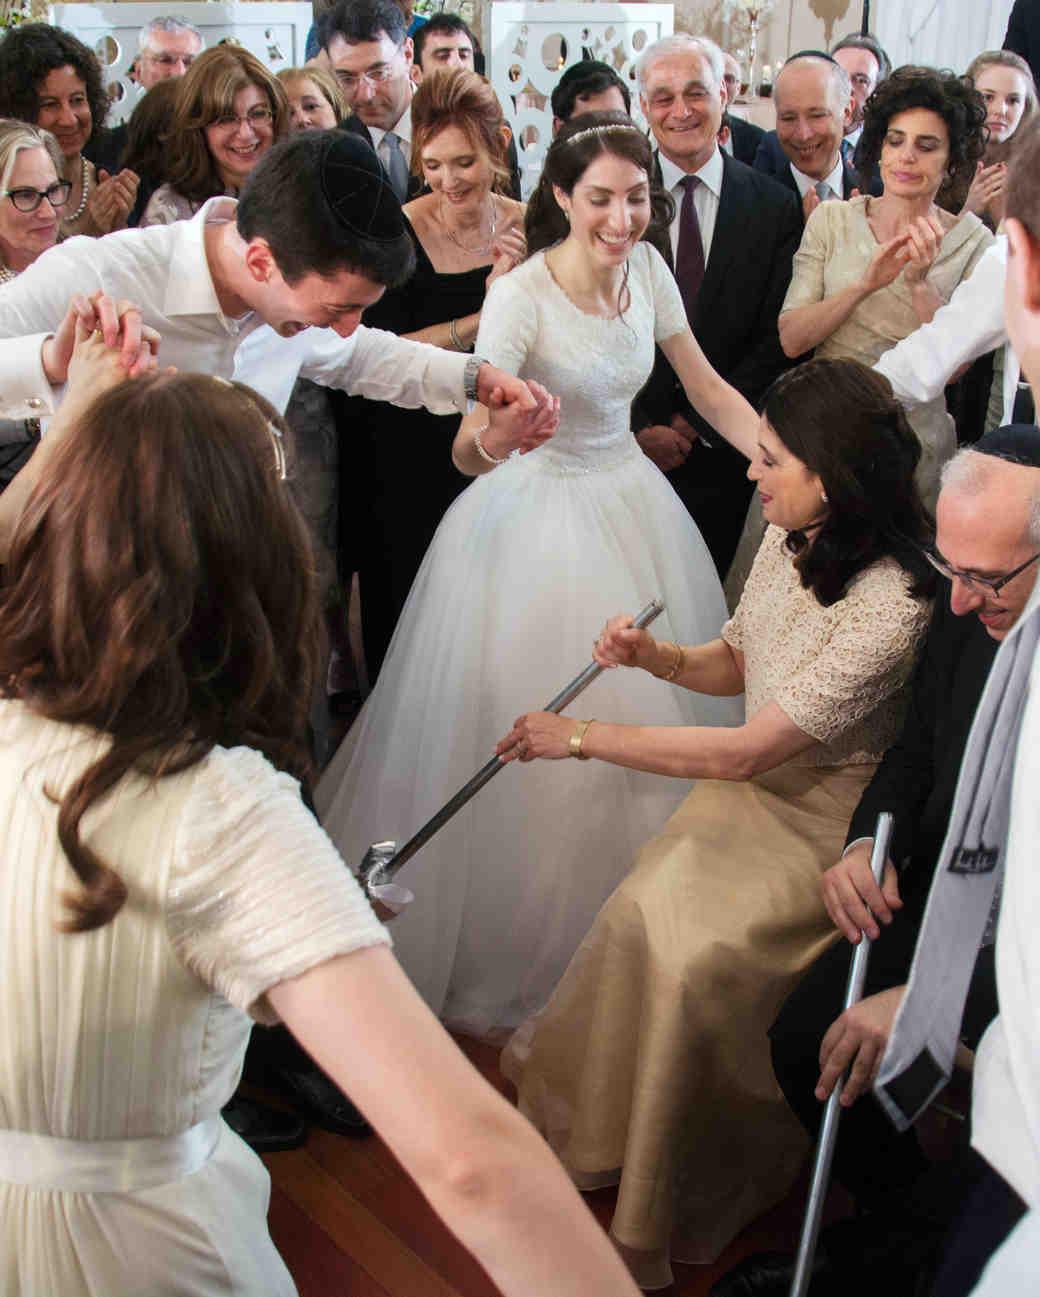 jewish-wedding-tradition-mezinka-sarena-0715.jpg